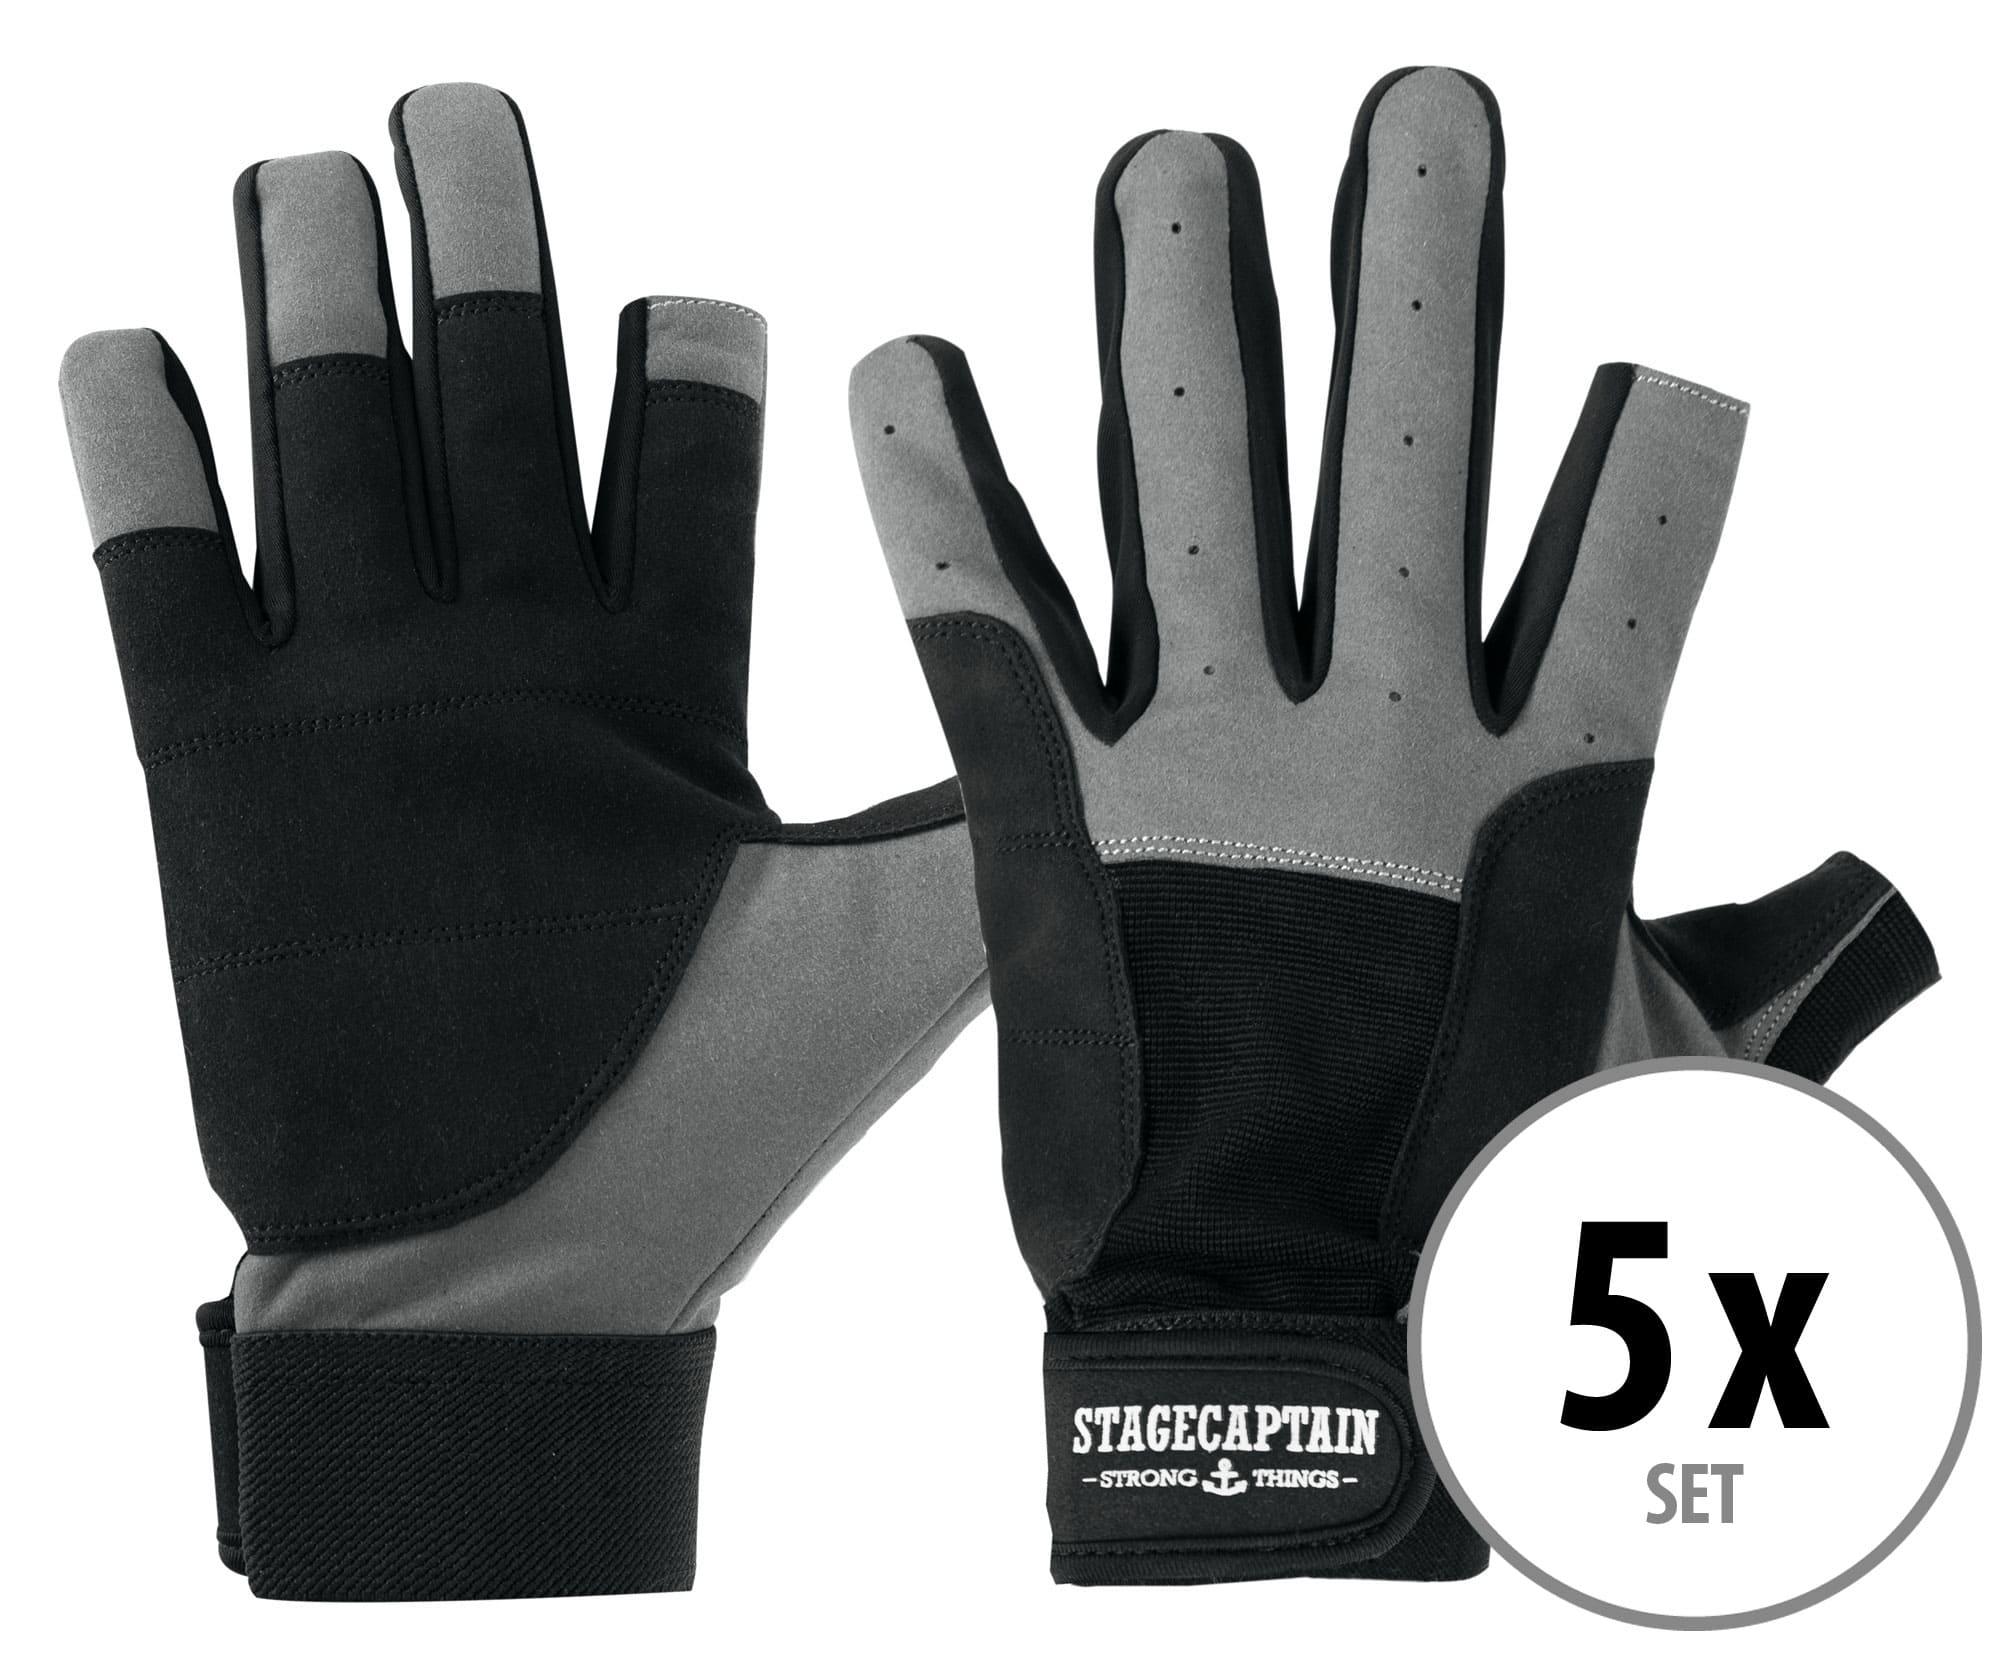 5er Set Stagecaptain Rigger Handschuhe M kurz